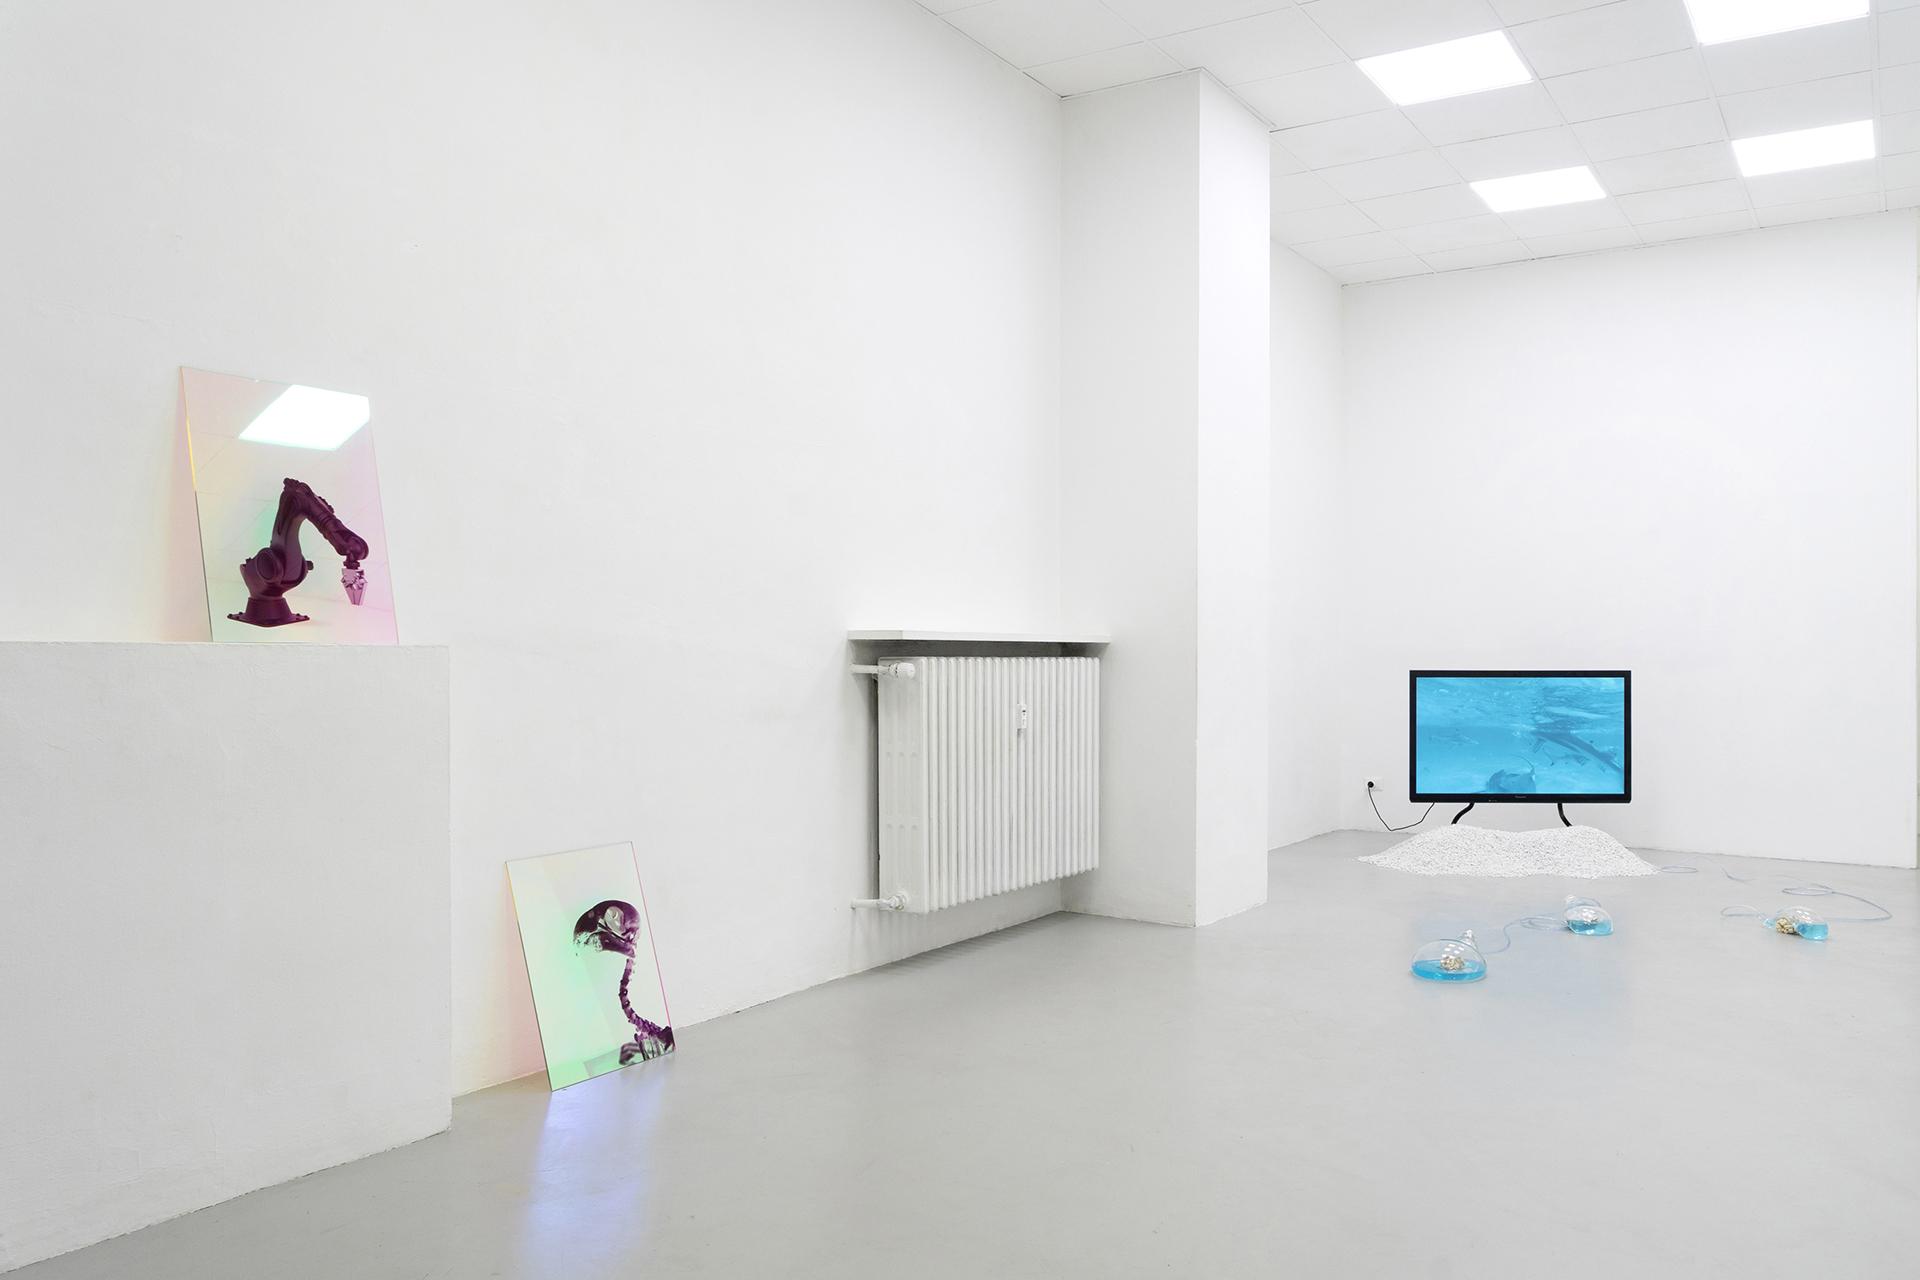 2-Paulo-Arraiano,-Sensorial-Divinities.-2019.-Exhibition-view.-Dimora-Artica-(ph-Cesare-Lopopolo).jpg